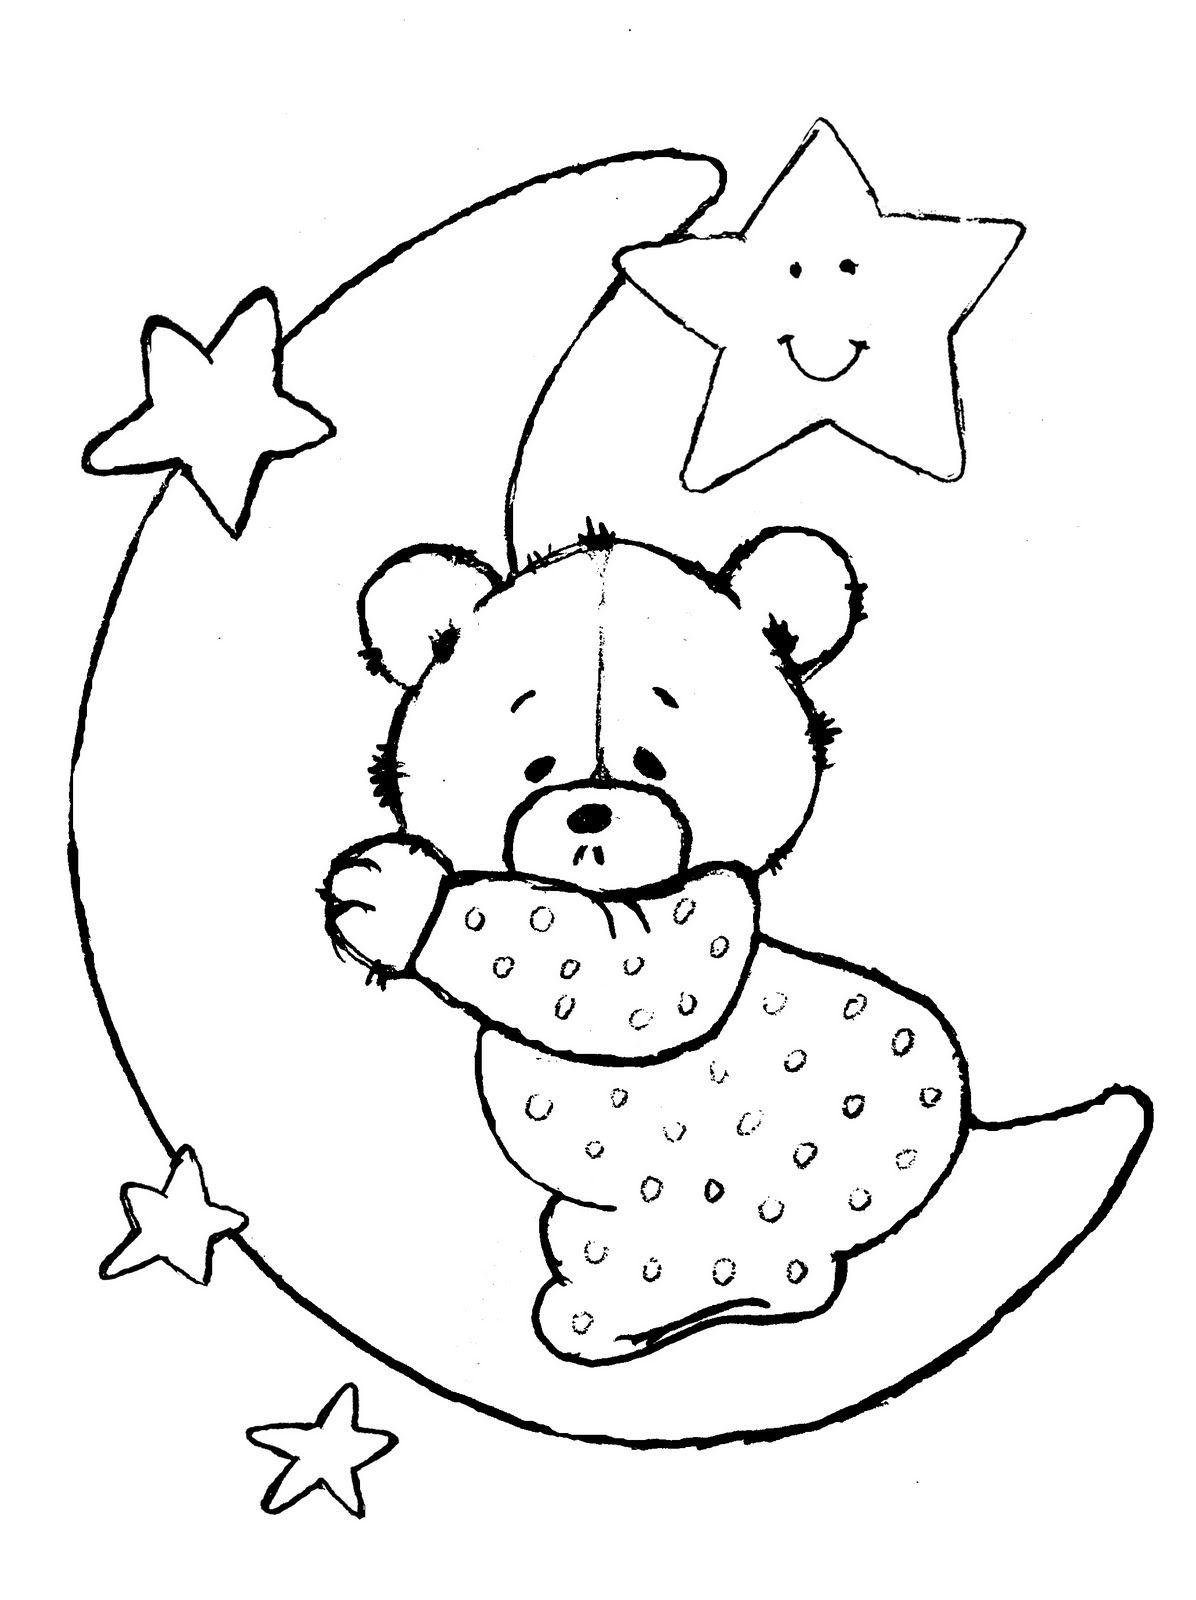 Hora de dormir... | dibujos infantiles | Pinterest | Duerme, Molde y ...